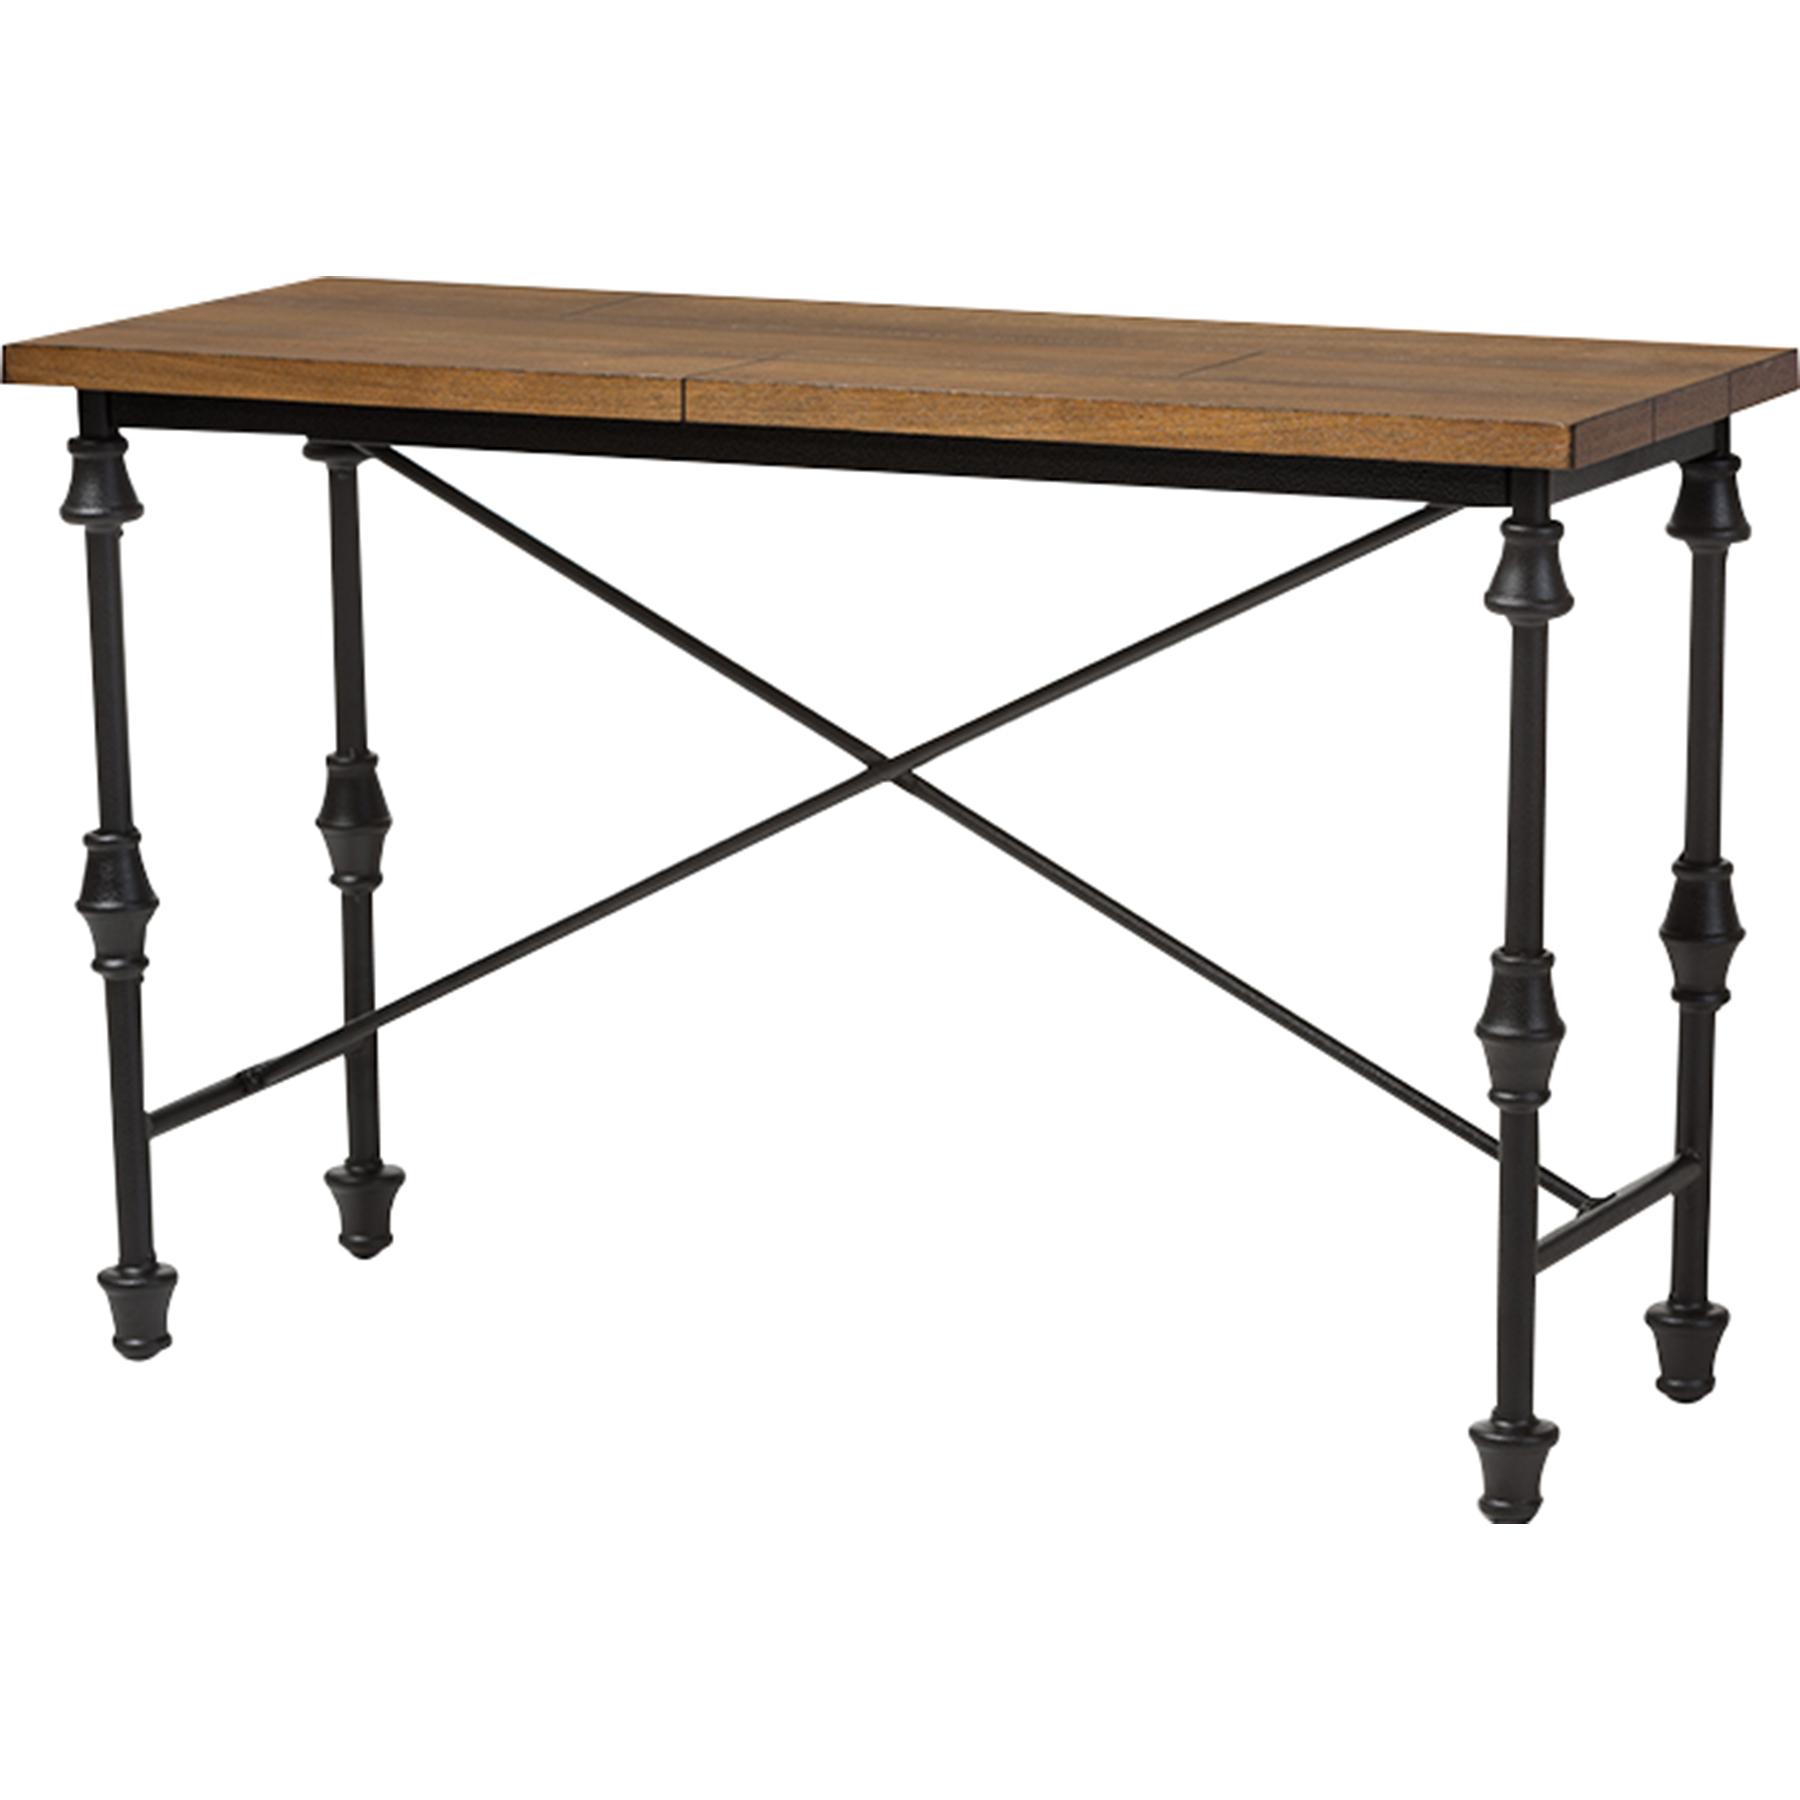 black sofa table. Julian Occasional Console Table - Brown, Black Sofa R